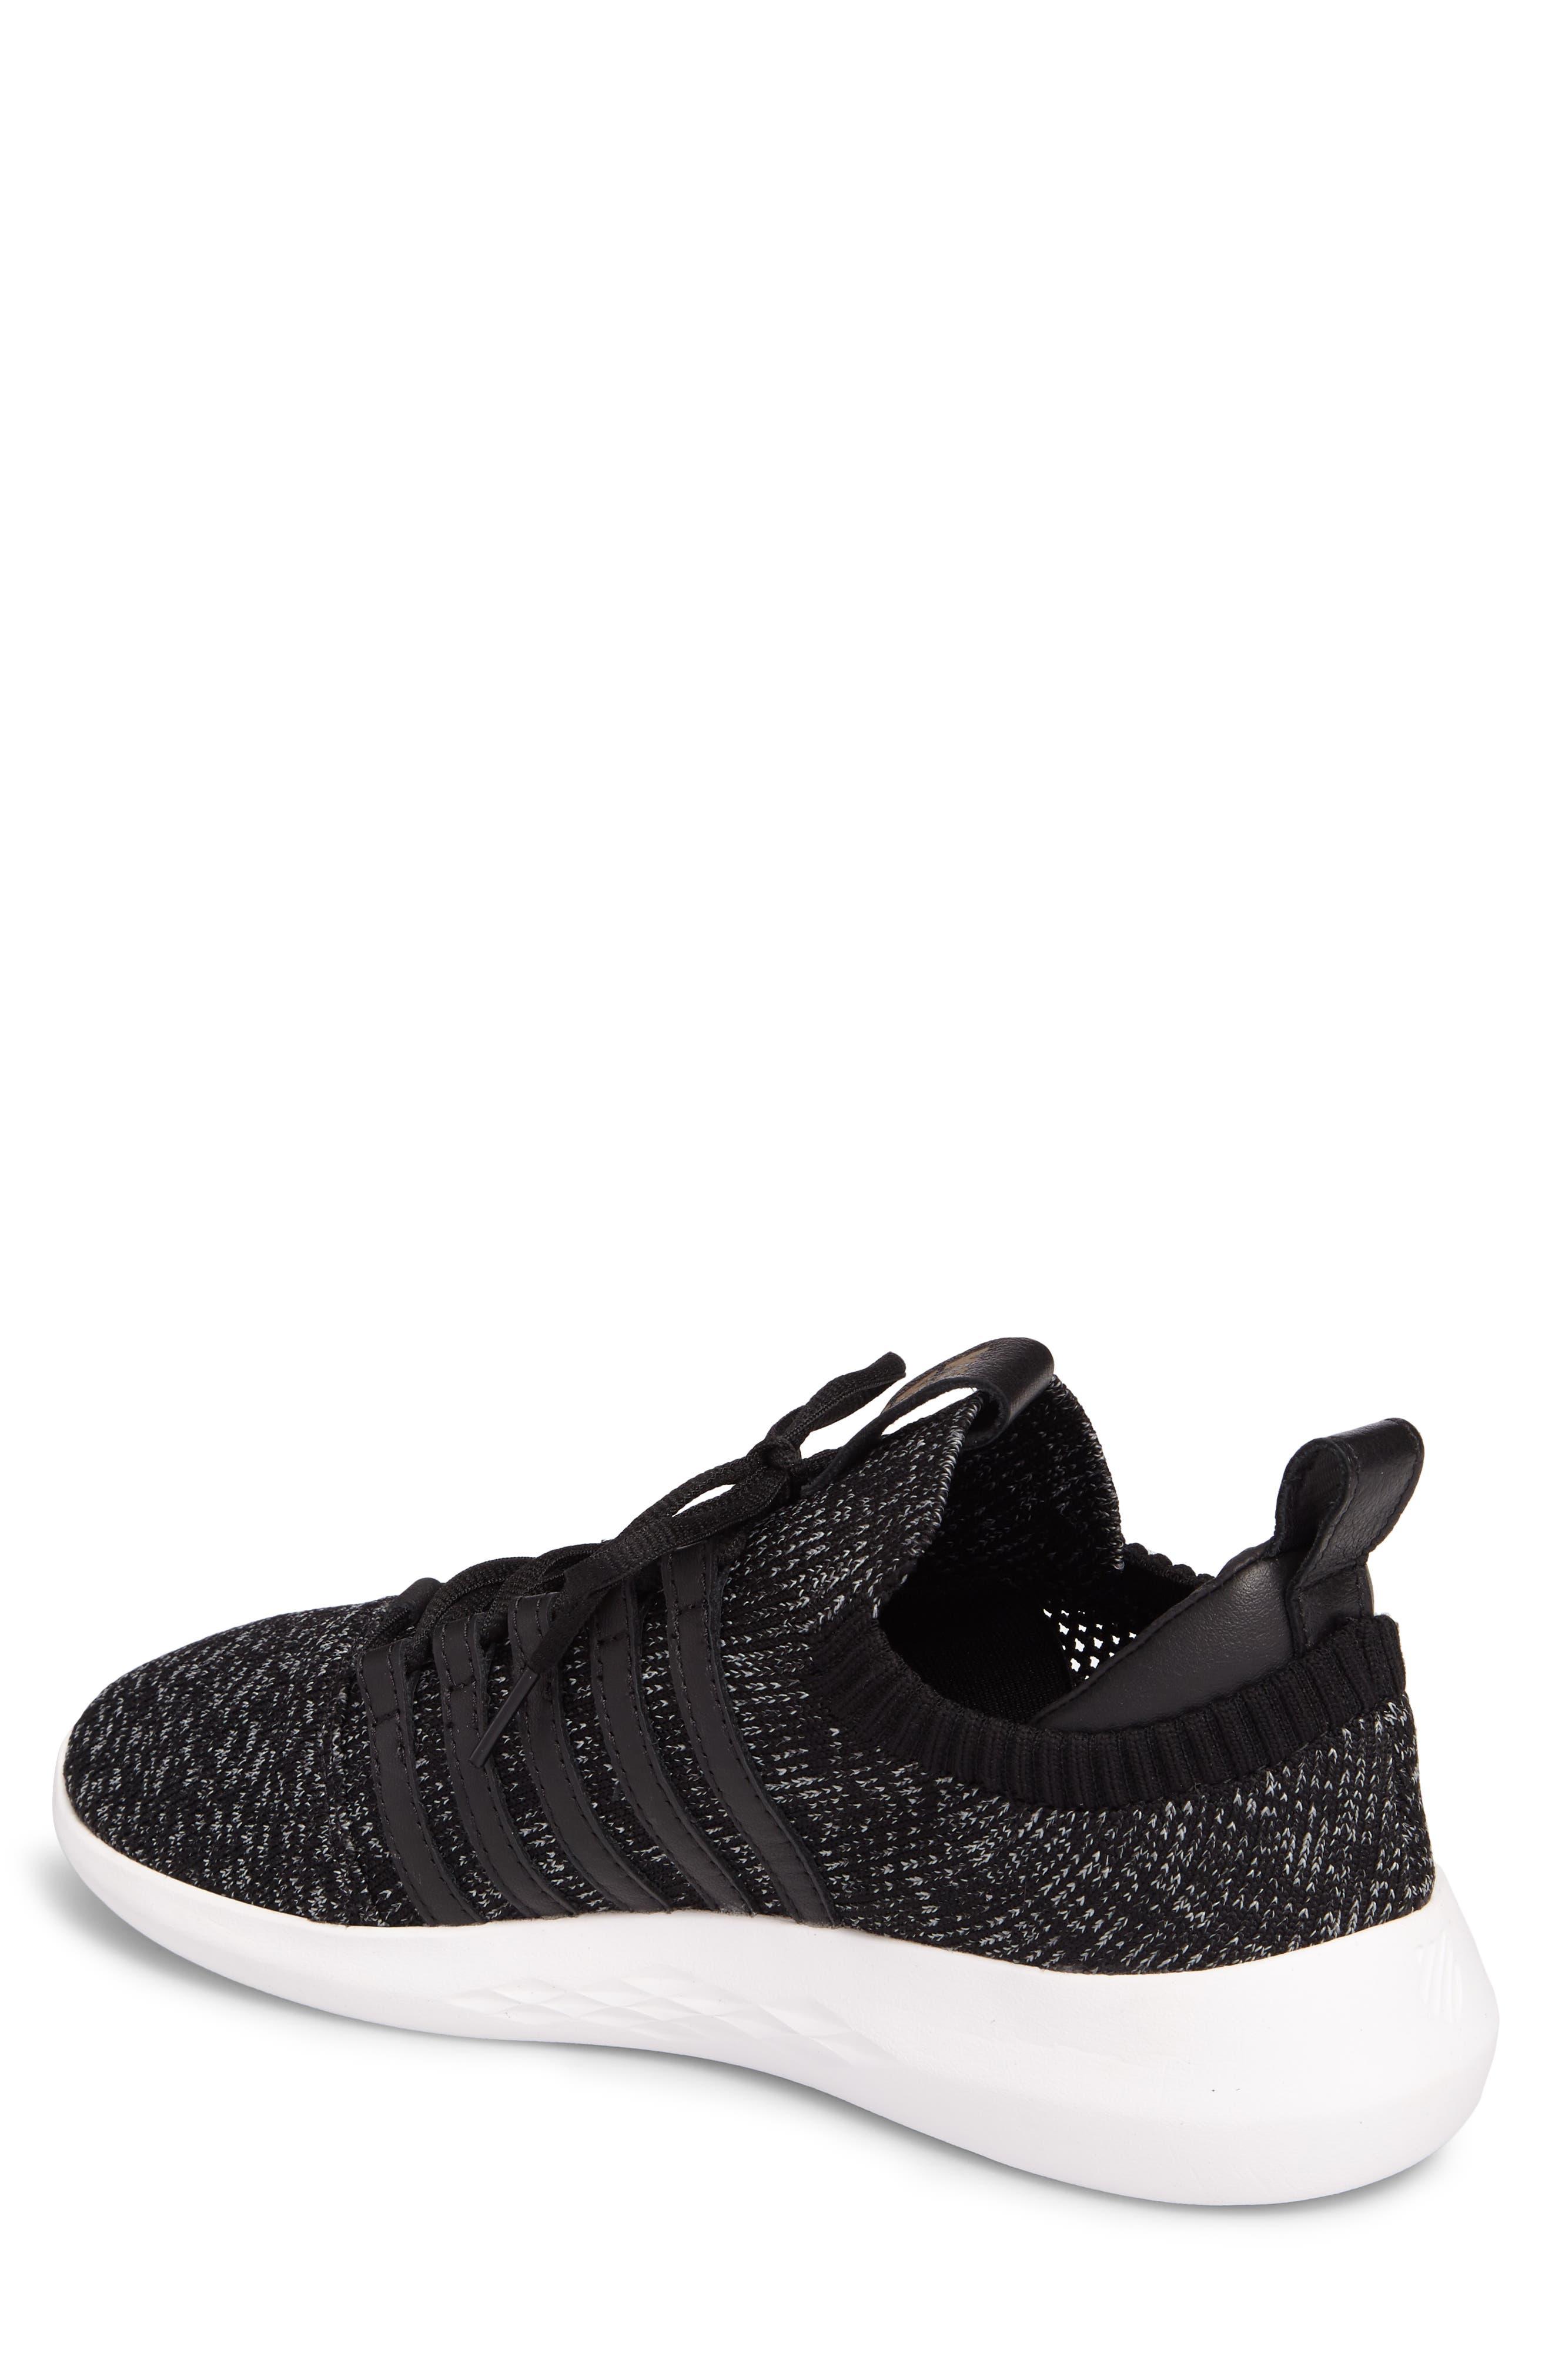 Gen-K Icon Knit Sneaker,                             Alternate thumbnail 2, color,                             BLACK/ GREY HEATHER